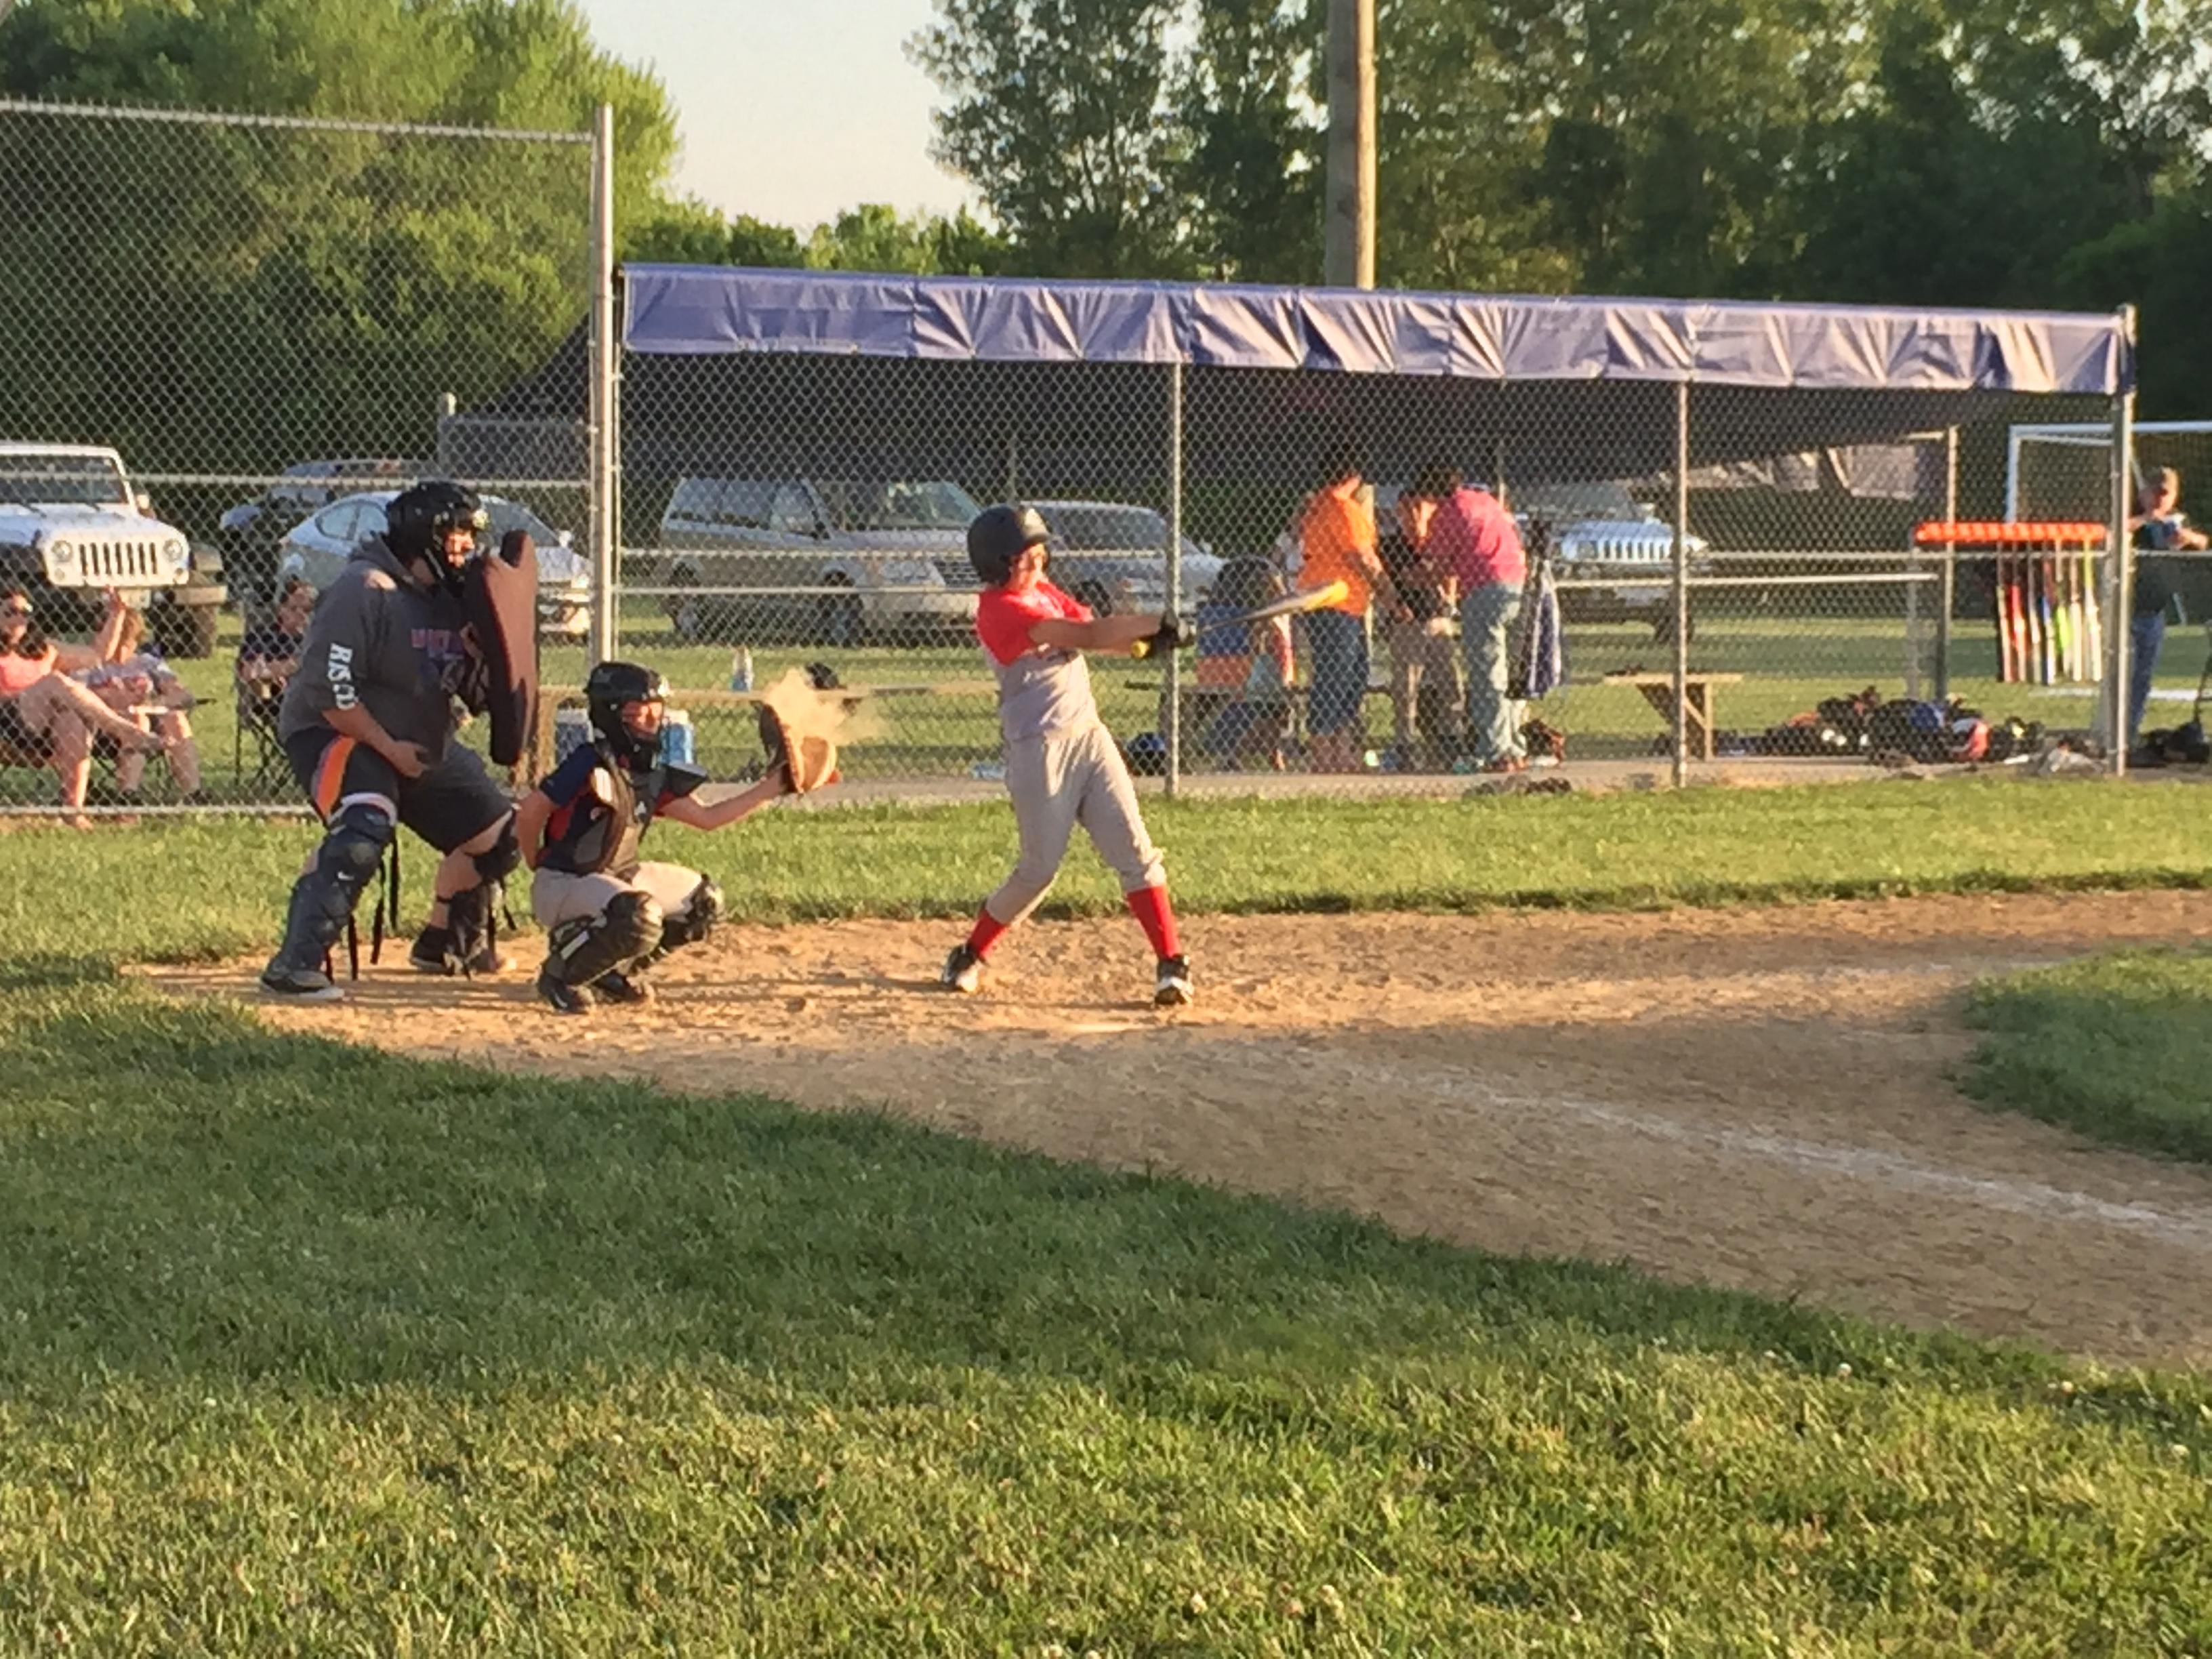 Got Dents of Springfield IL, Vs Riverton Twins of Riverton IL, Make up Game, Got Dents 15 vs Riverton Twins 5 http://217dent.com